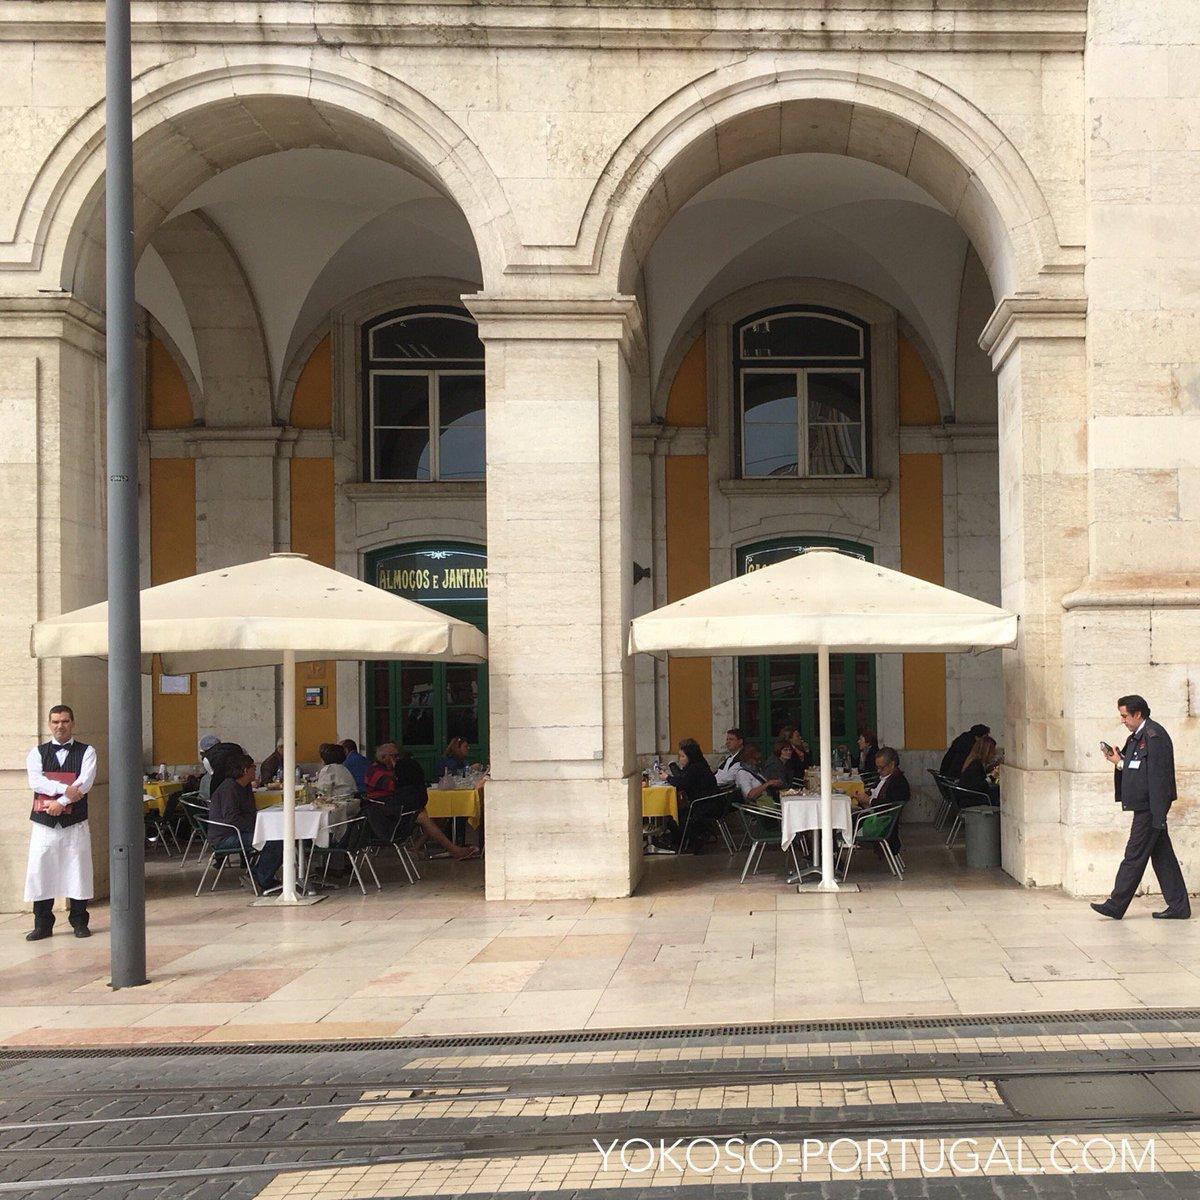 test ツイッターメディア - 詩人フェルナンド・ペソアのお気に入りだった、リスボンのコメルシオ広場にある1782年創業のカフェ。 (@ Café Martinho da Arcada in Lisboa) https://t.co/EEU4gwPrHv https://t.co/V78BTjFt2W